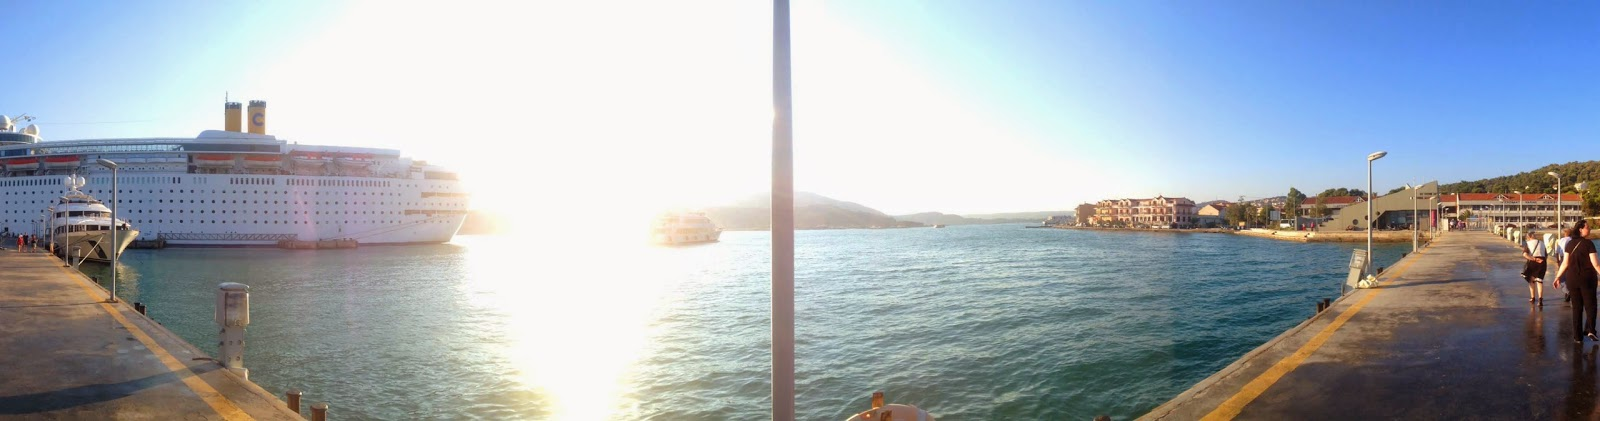 Jennava Laska S Cruise Travel Journal Vacation Tips And